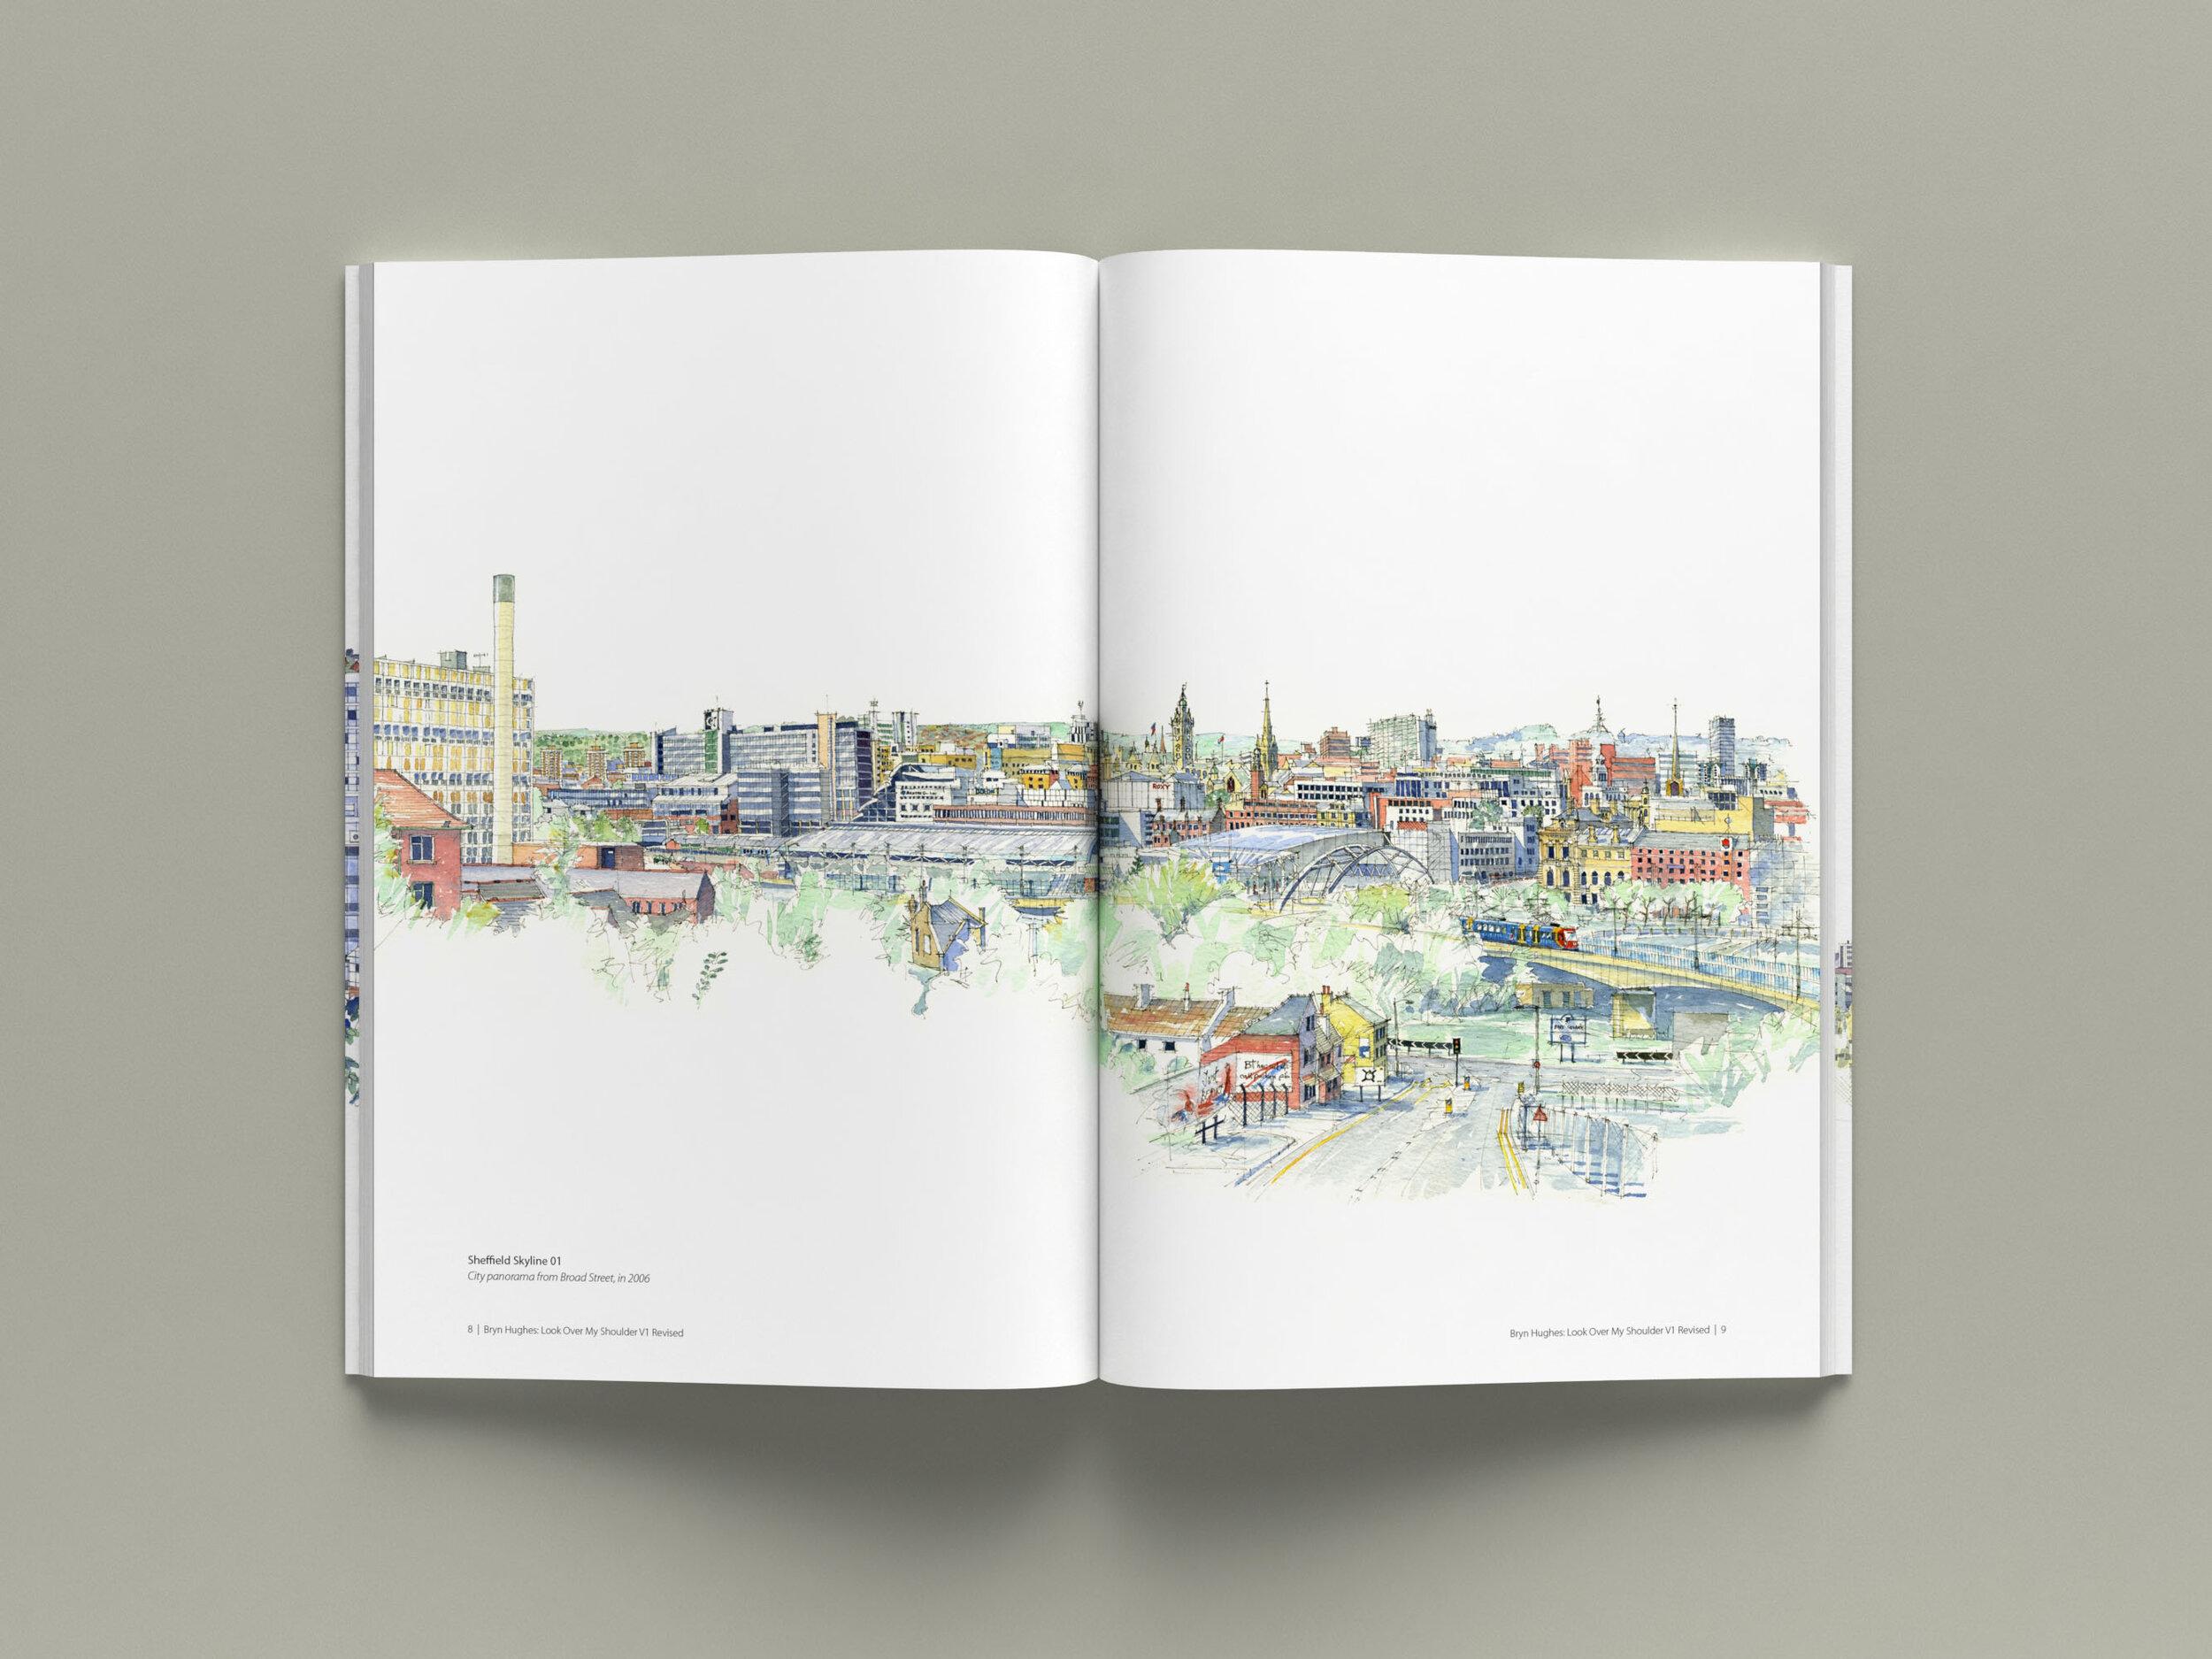 BRYN-HUGHES-ARTIST-SOFTBACK-BOOK02-B-_0037_Group 5.jpg